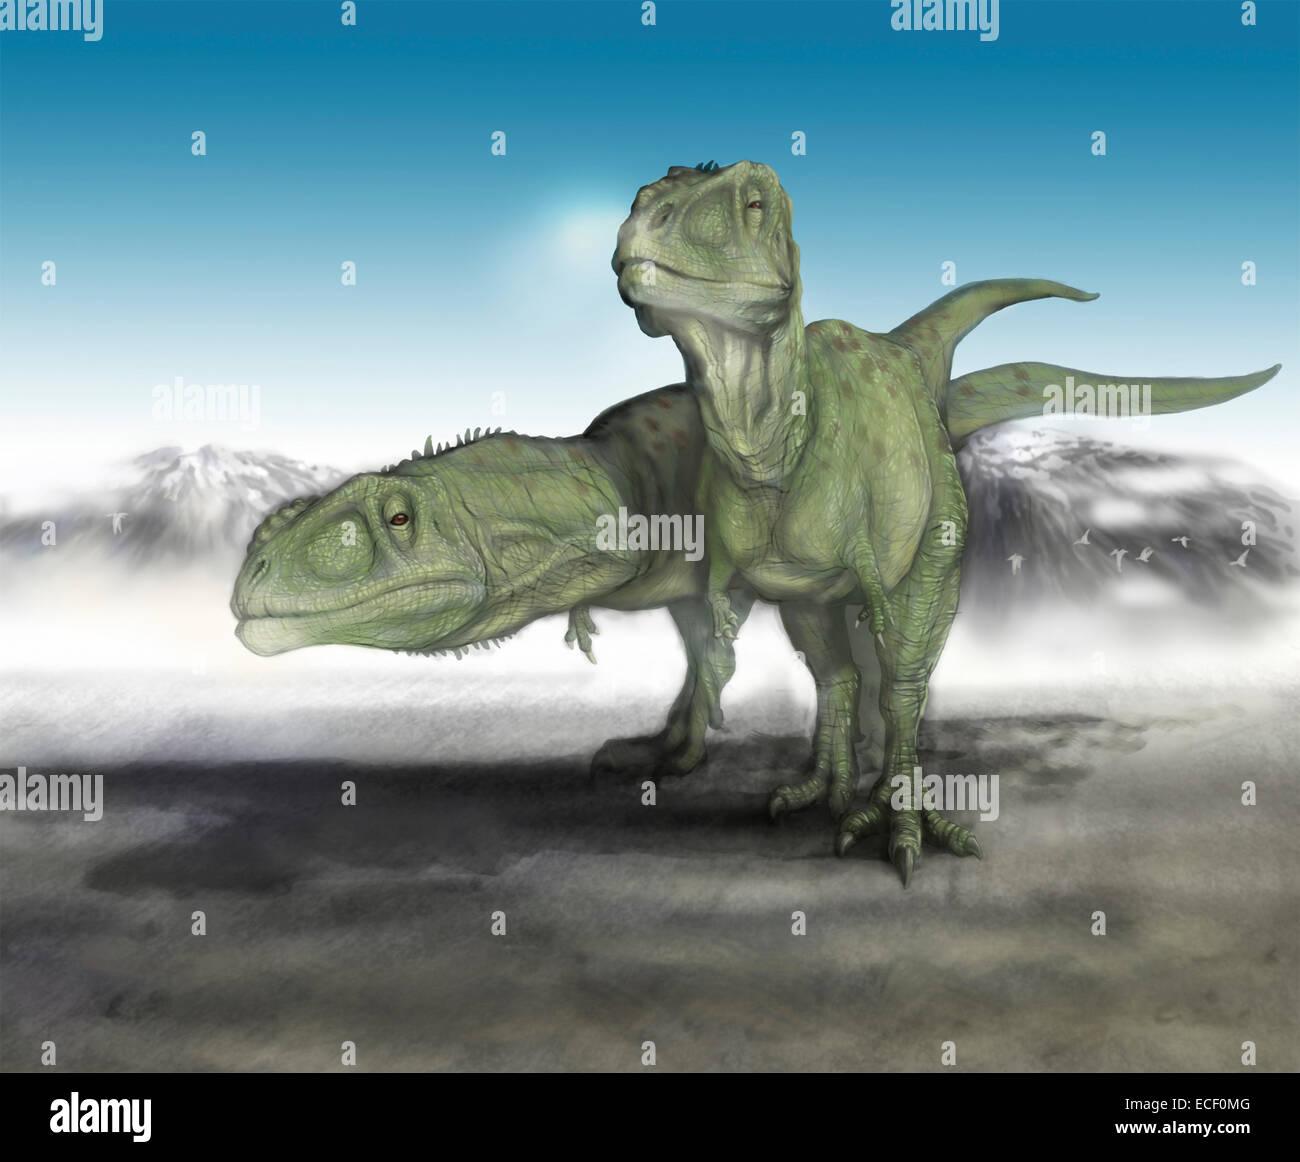 A Pair Of Young Giganotosaurus Carolinii Make Their Way